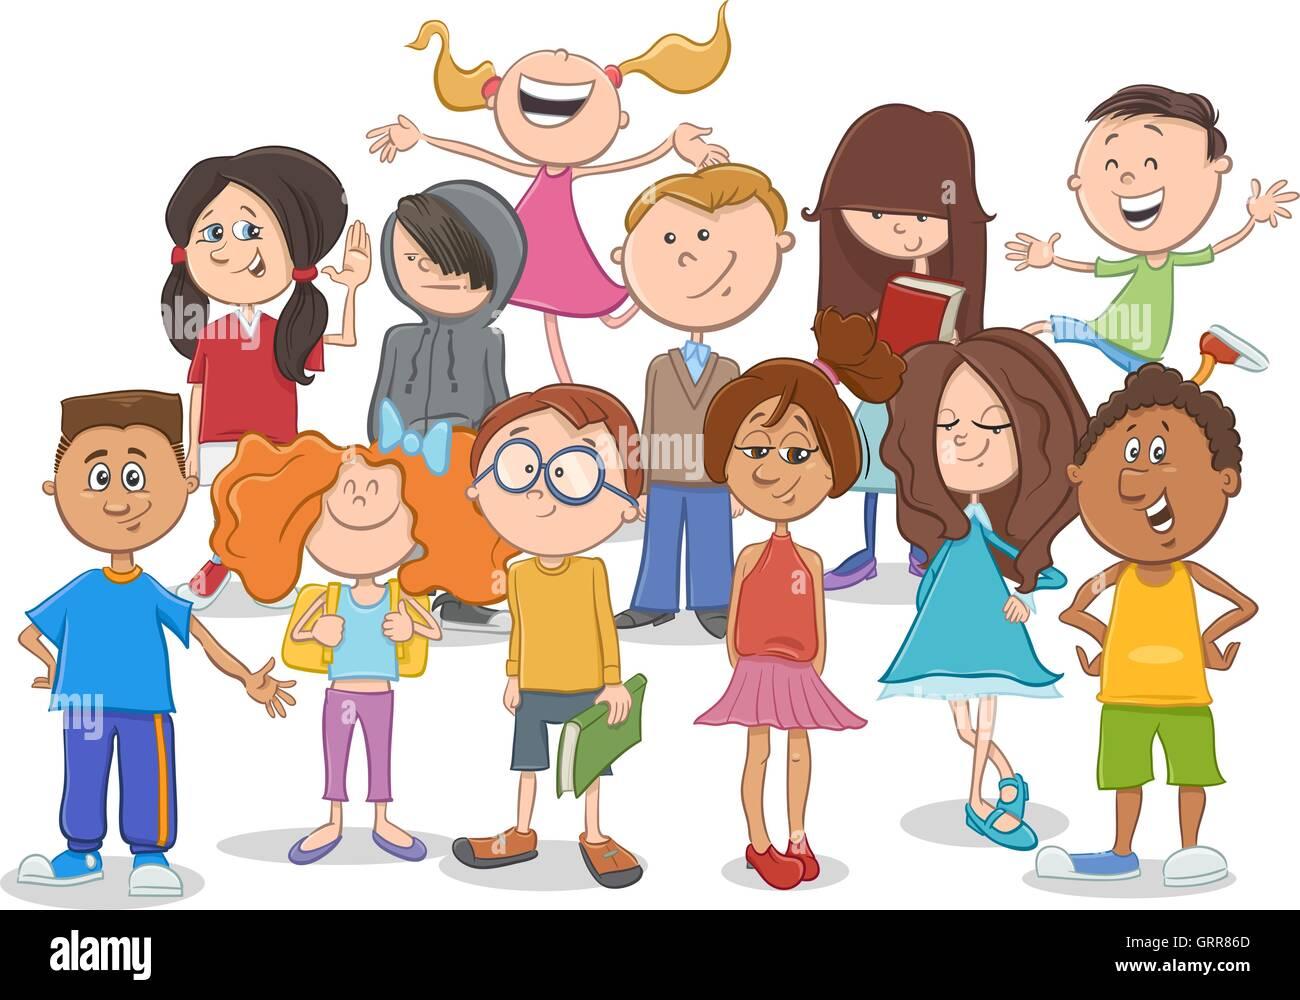 cartoon illustration of elementary age children or teen